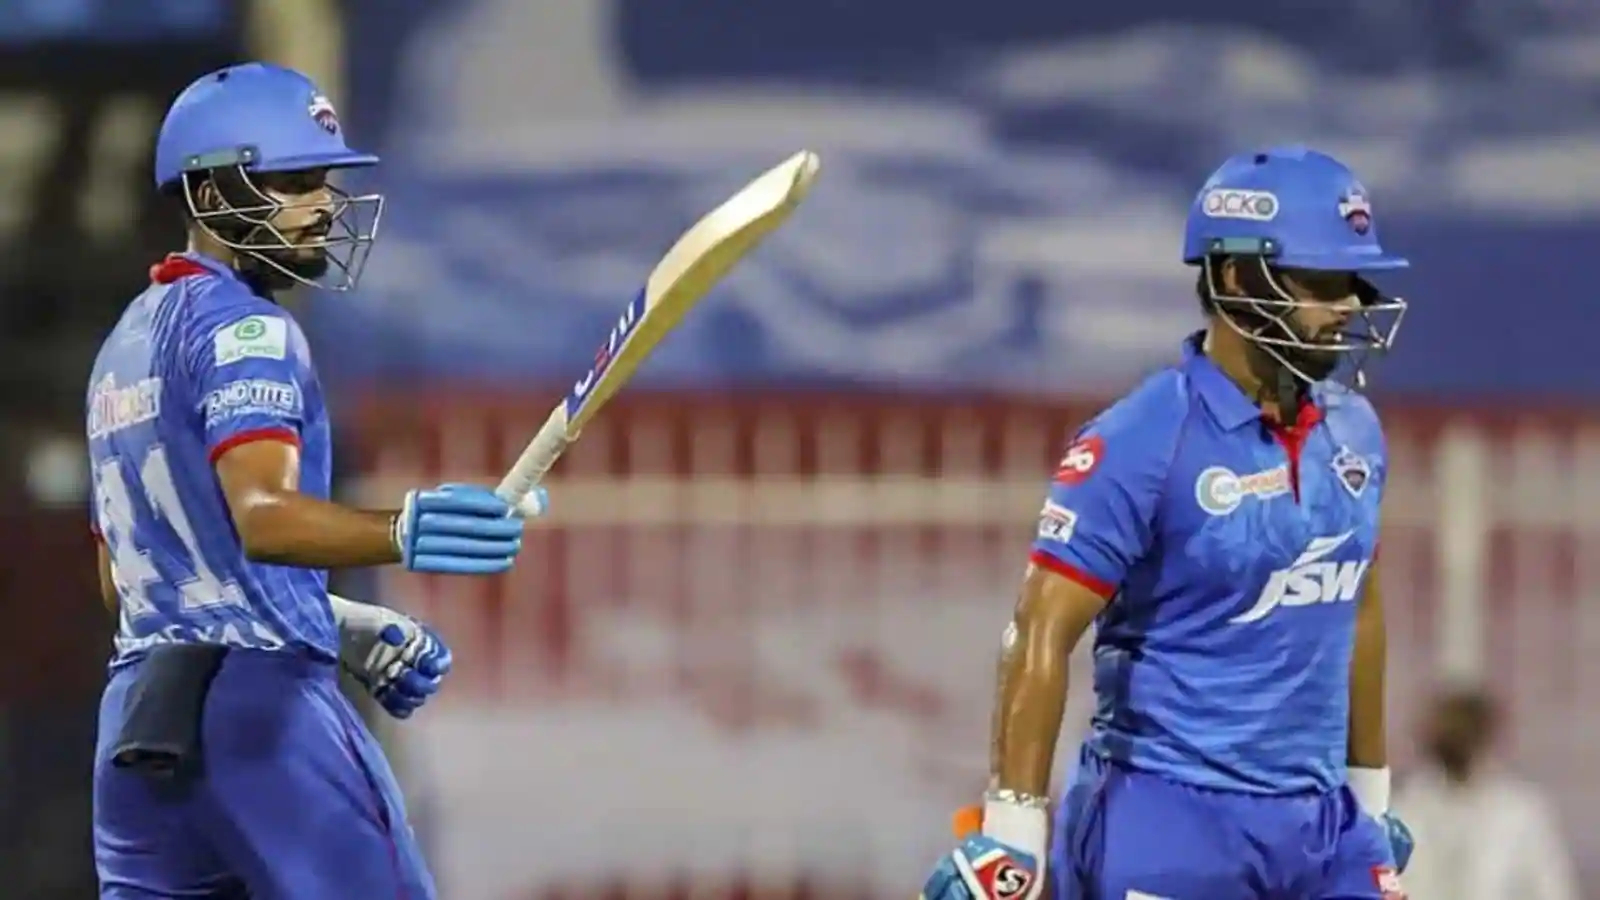 Rishabh Pant will captain DC in IPL 2021 in place of injured Shreyas Iyer   BCCI/IPL